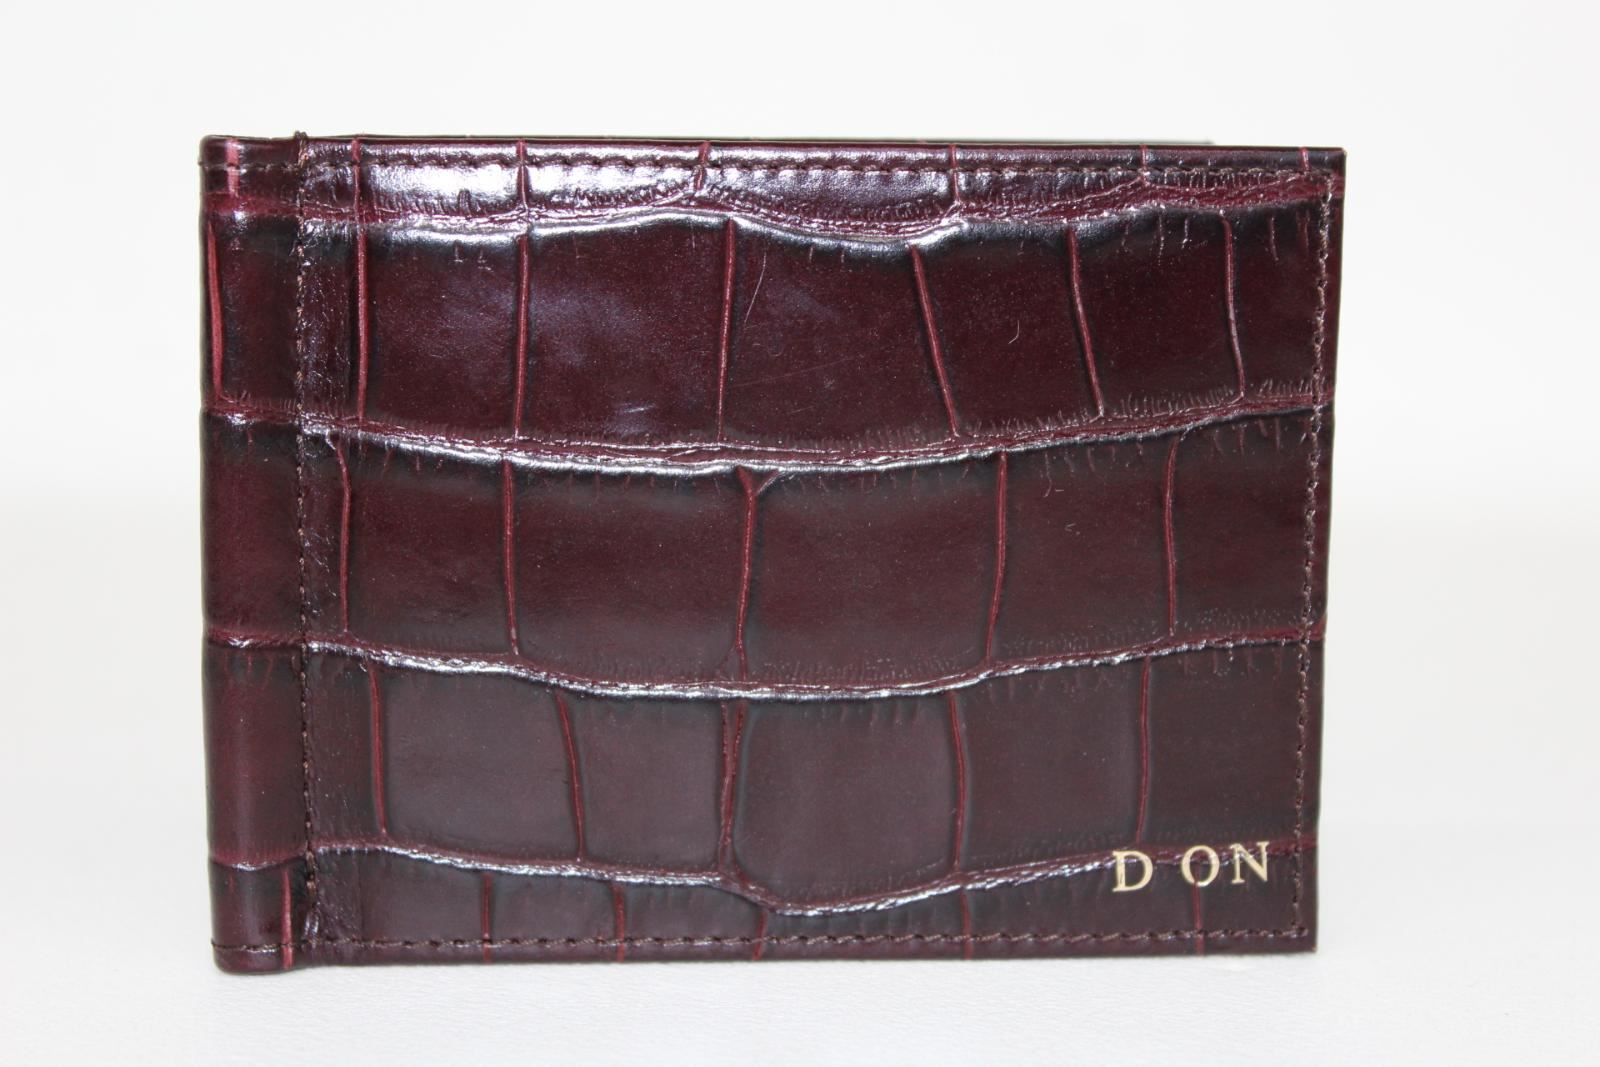 ASPINAL-OF-LONDON-Calf-Amazon-Brown-Croc-Money-Clip-Billfold-Embossed-Wallet